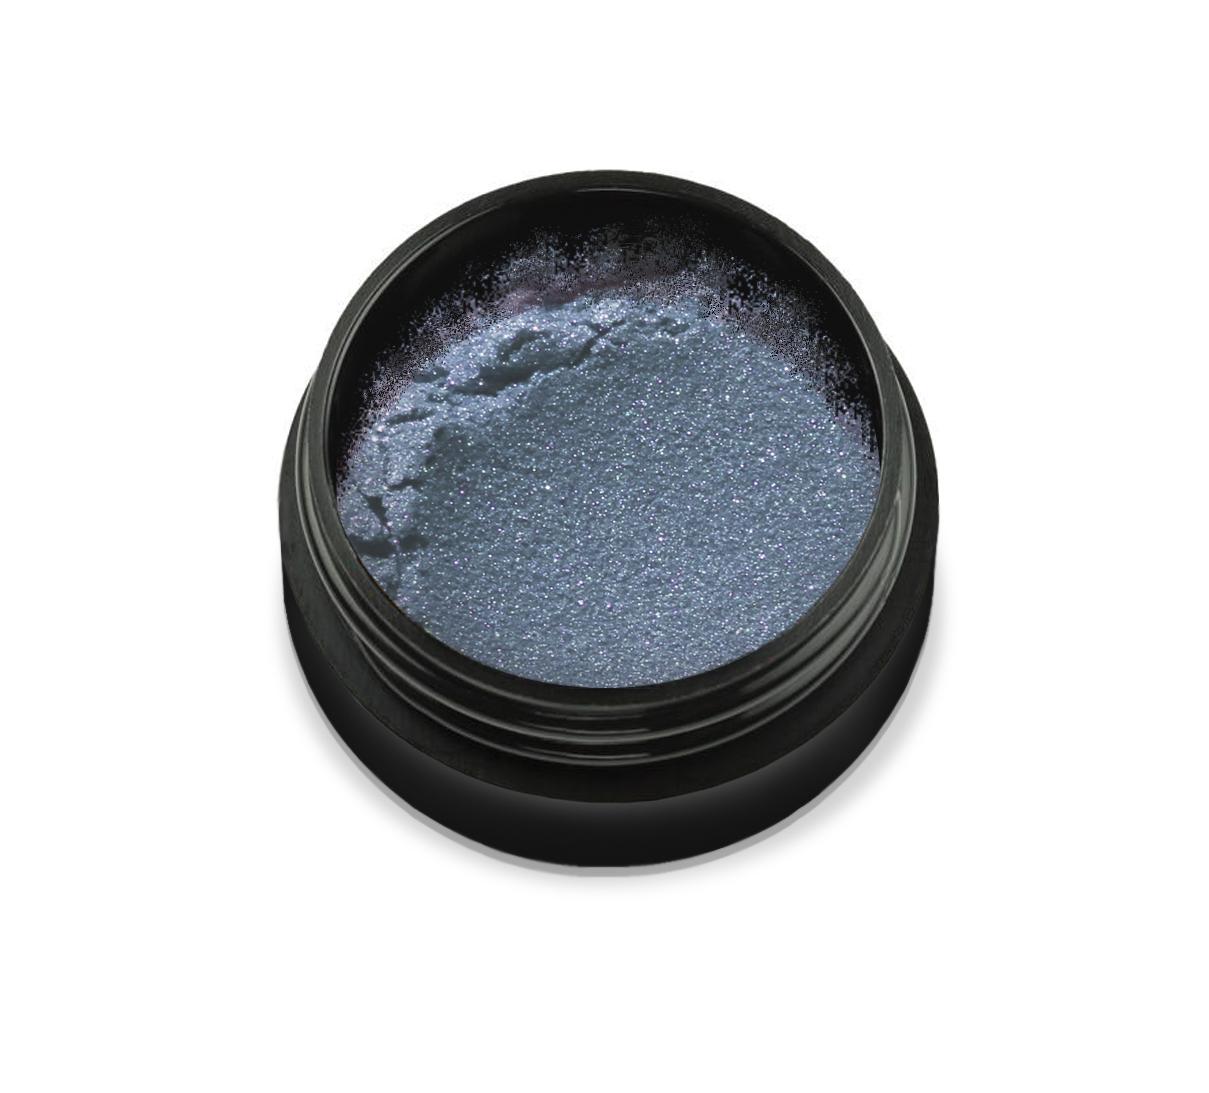 "6041 Pudra cu pigmenti 'Didier Lab"", cambridge blue 2,5g/Pigment powder 'Didier Lab"", cambridge blue"